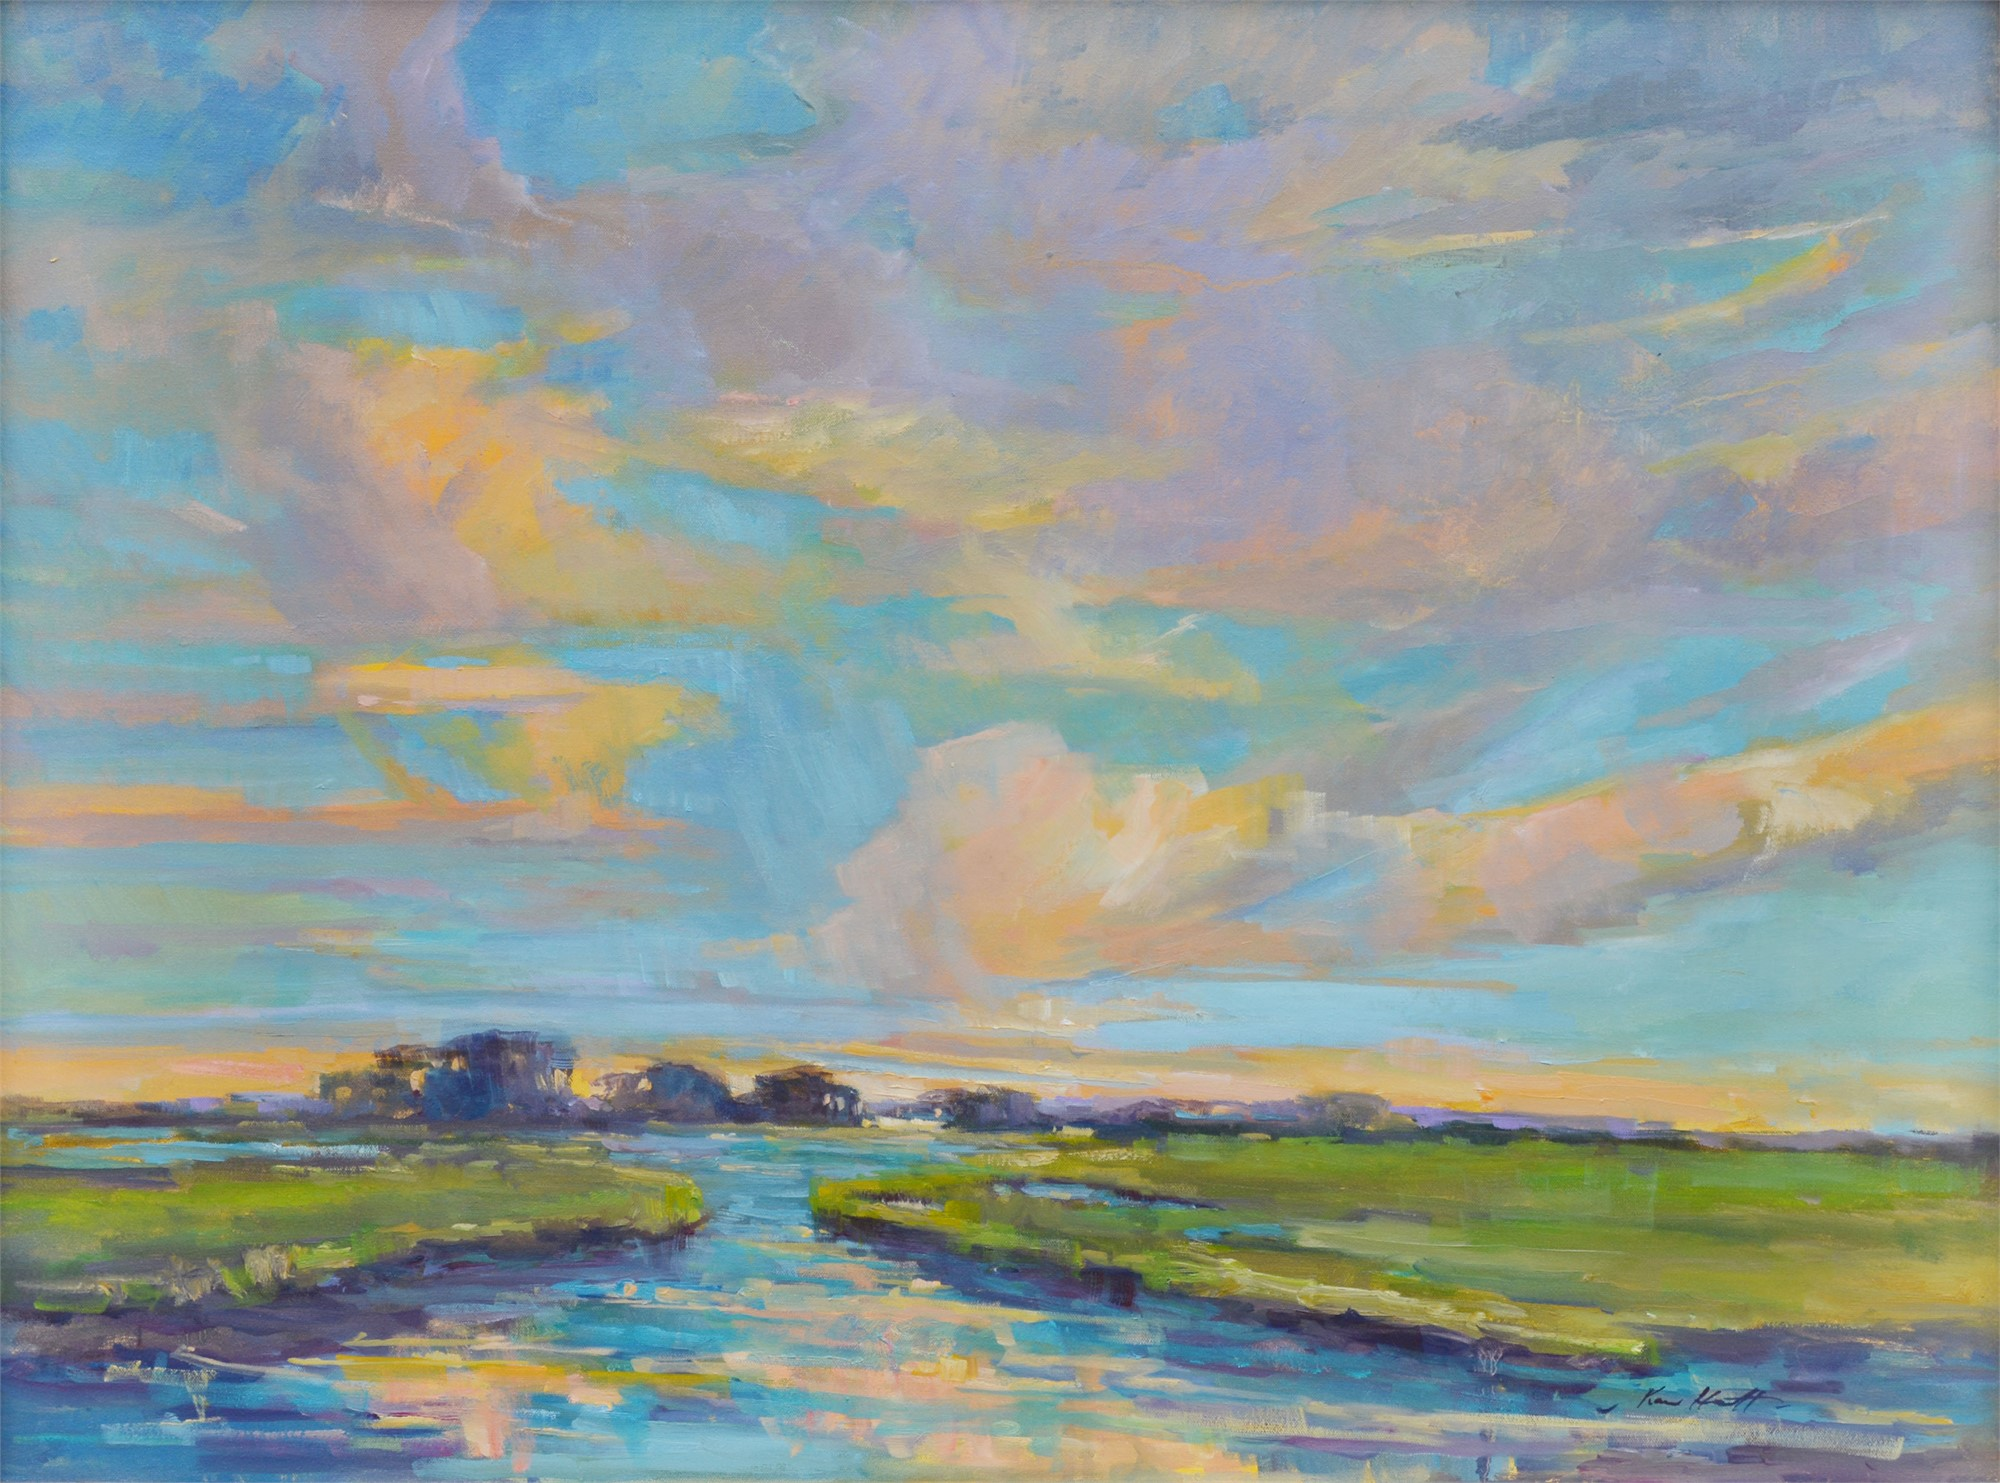 Marsh at Dawn by Karen Hewitt Hagan